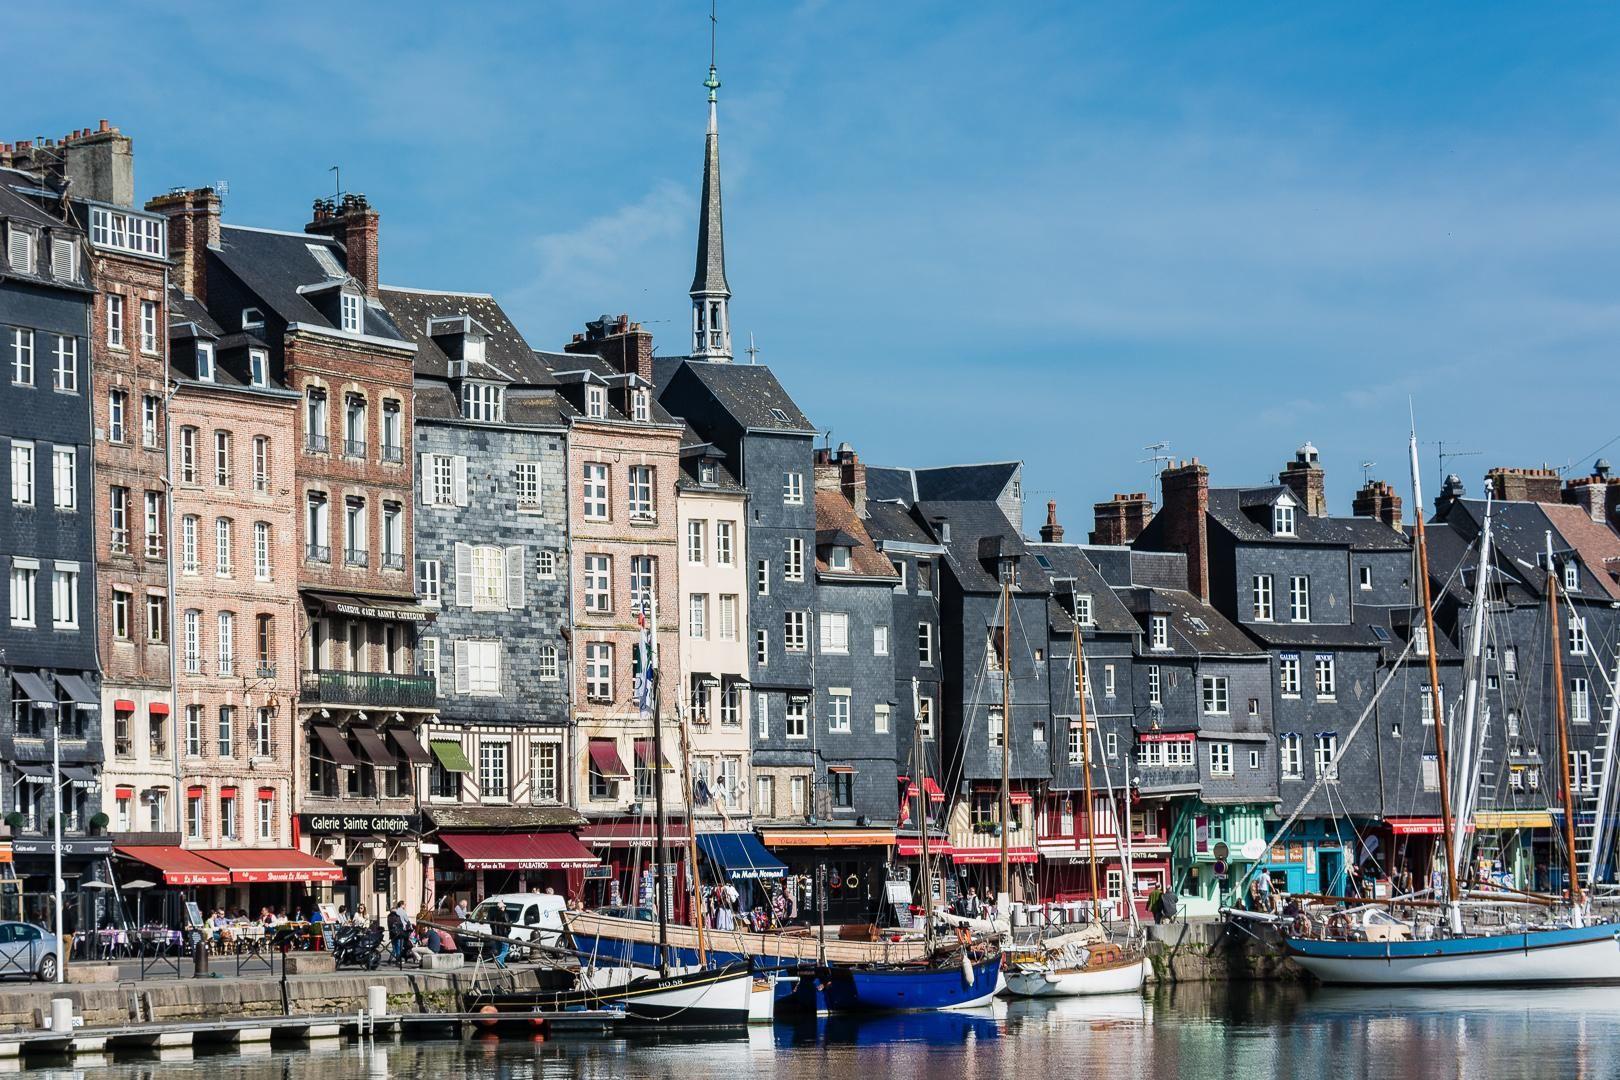 Honfleur a picturesque norman port town 作者 fotopedia